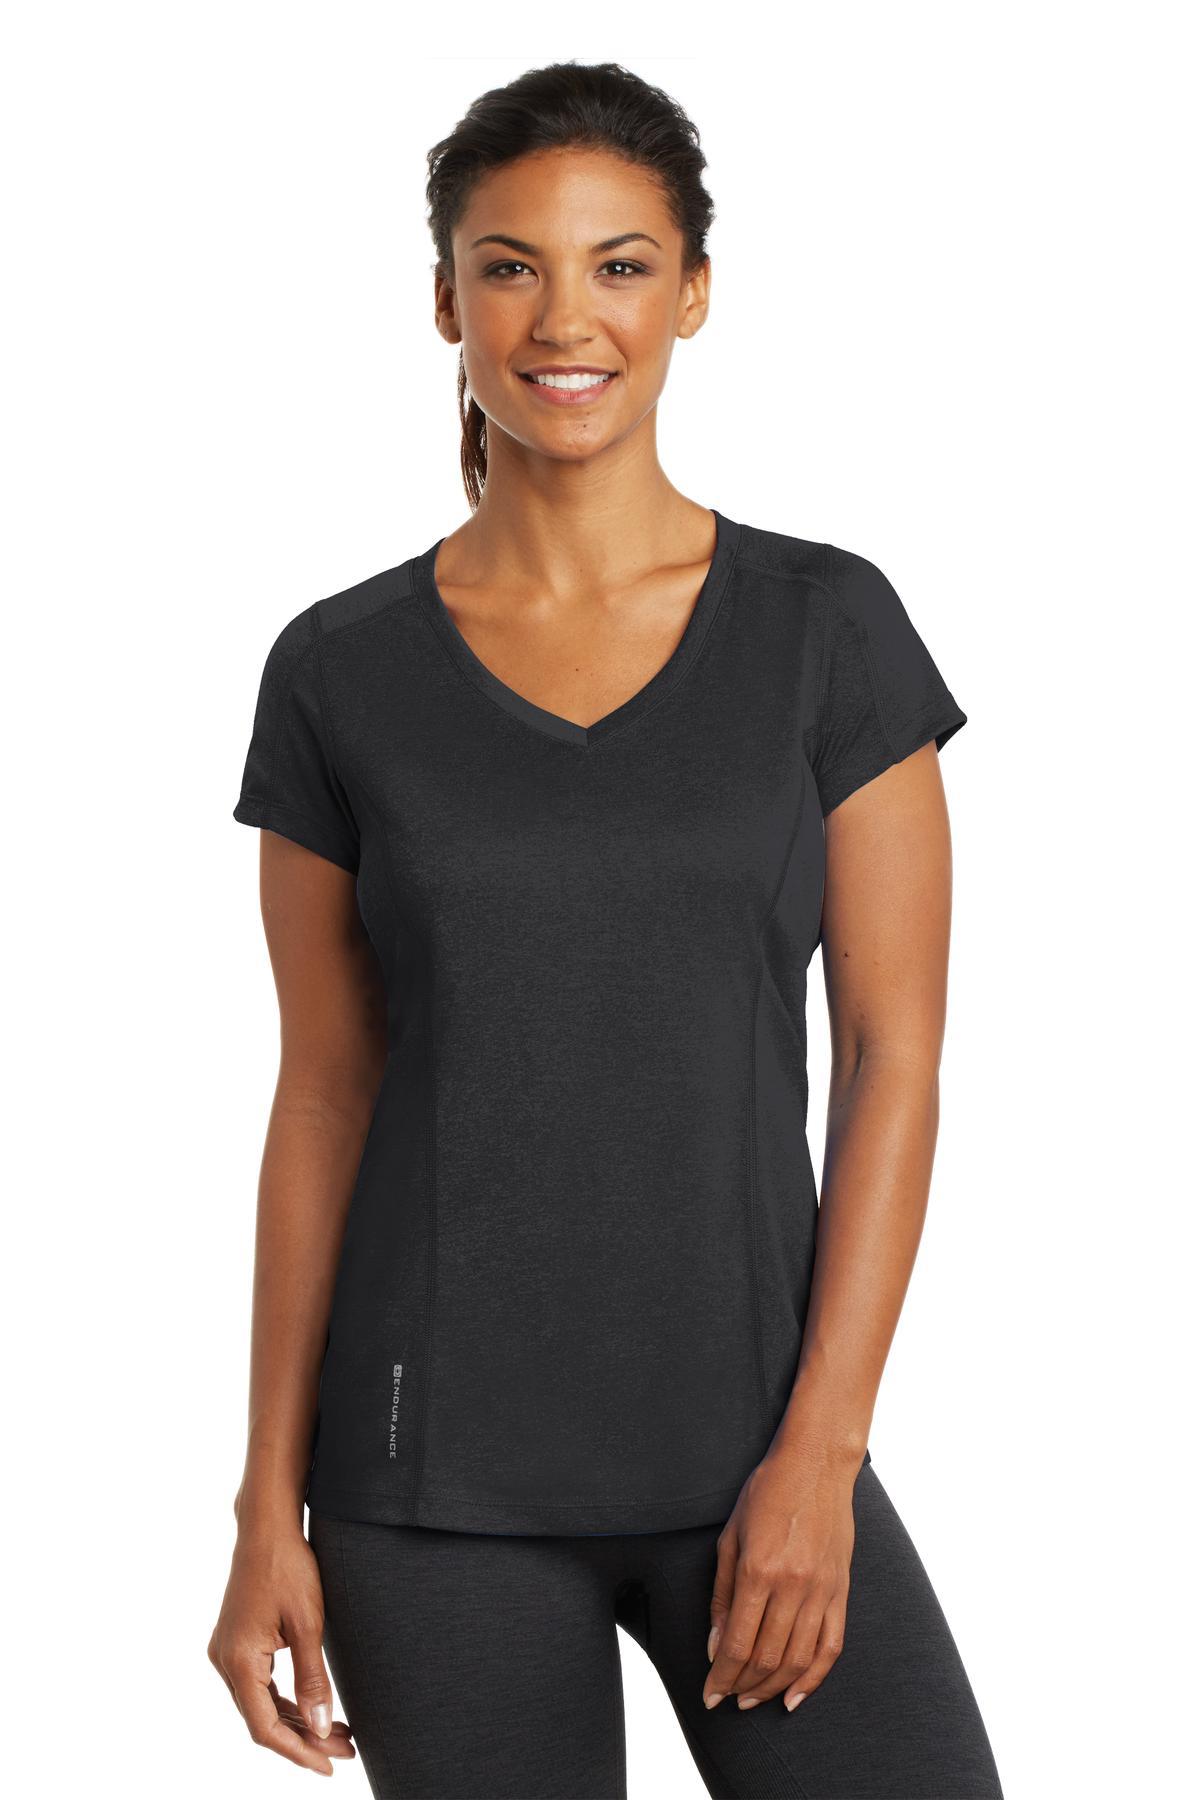 544691235-120 - OGIO® Endurance Ladies Pulse V-Neck Shirt - thumbnail